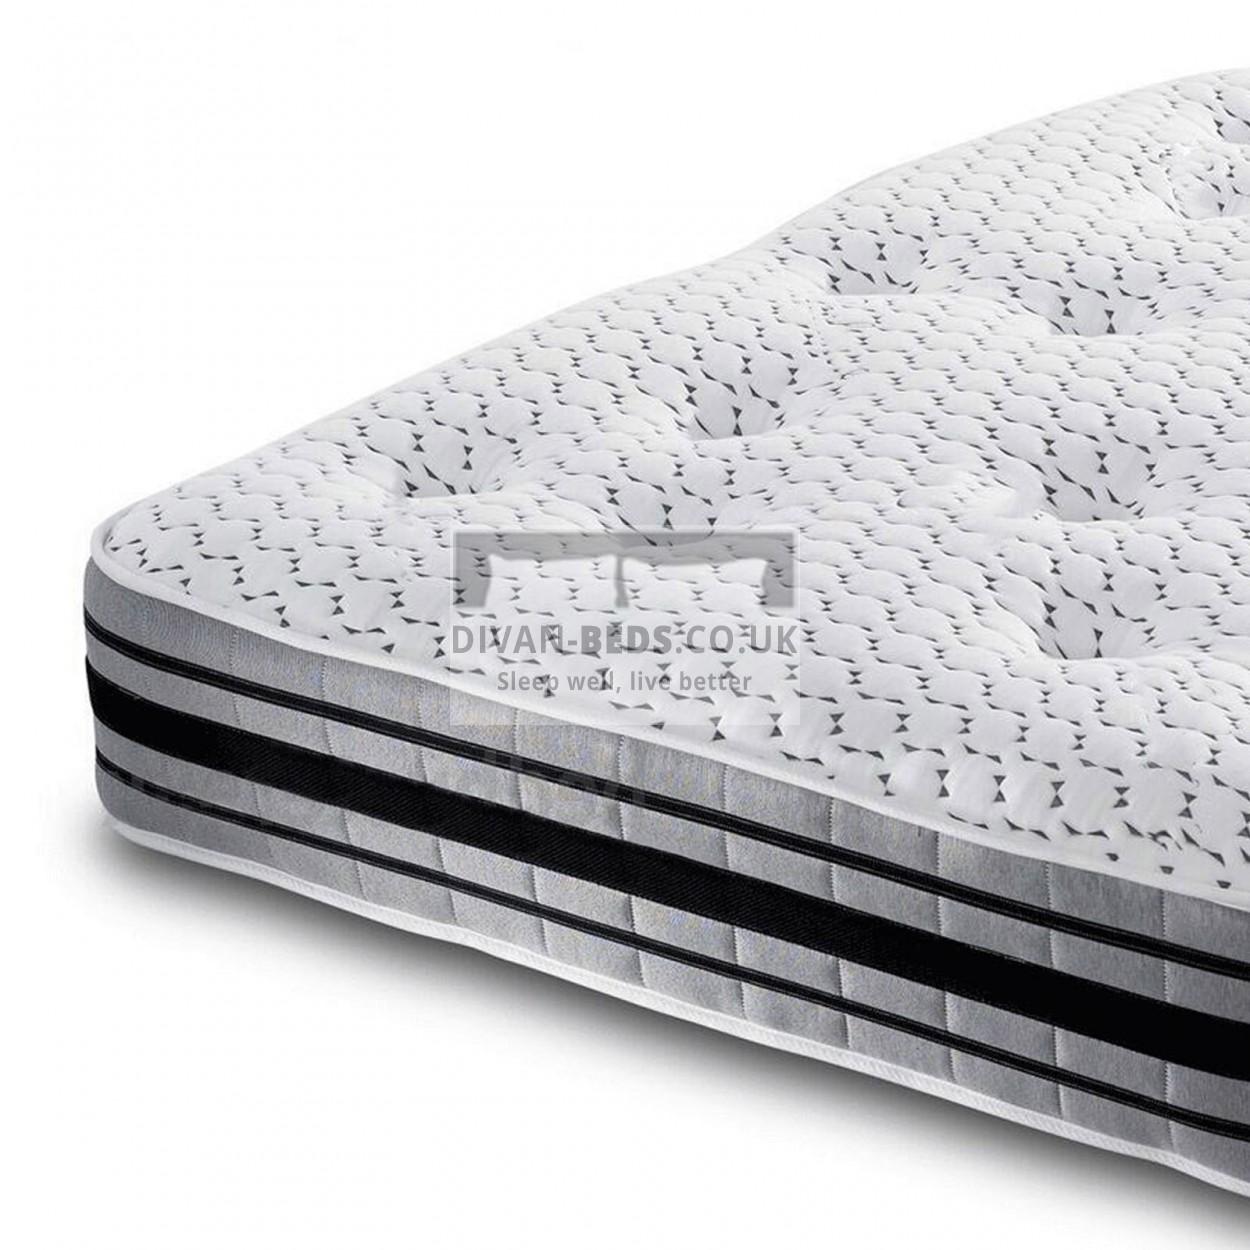 3000 Pocket Spring Organic Quilted Memory Foam Mattress